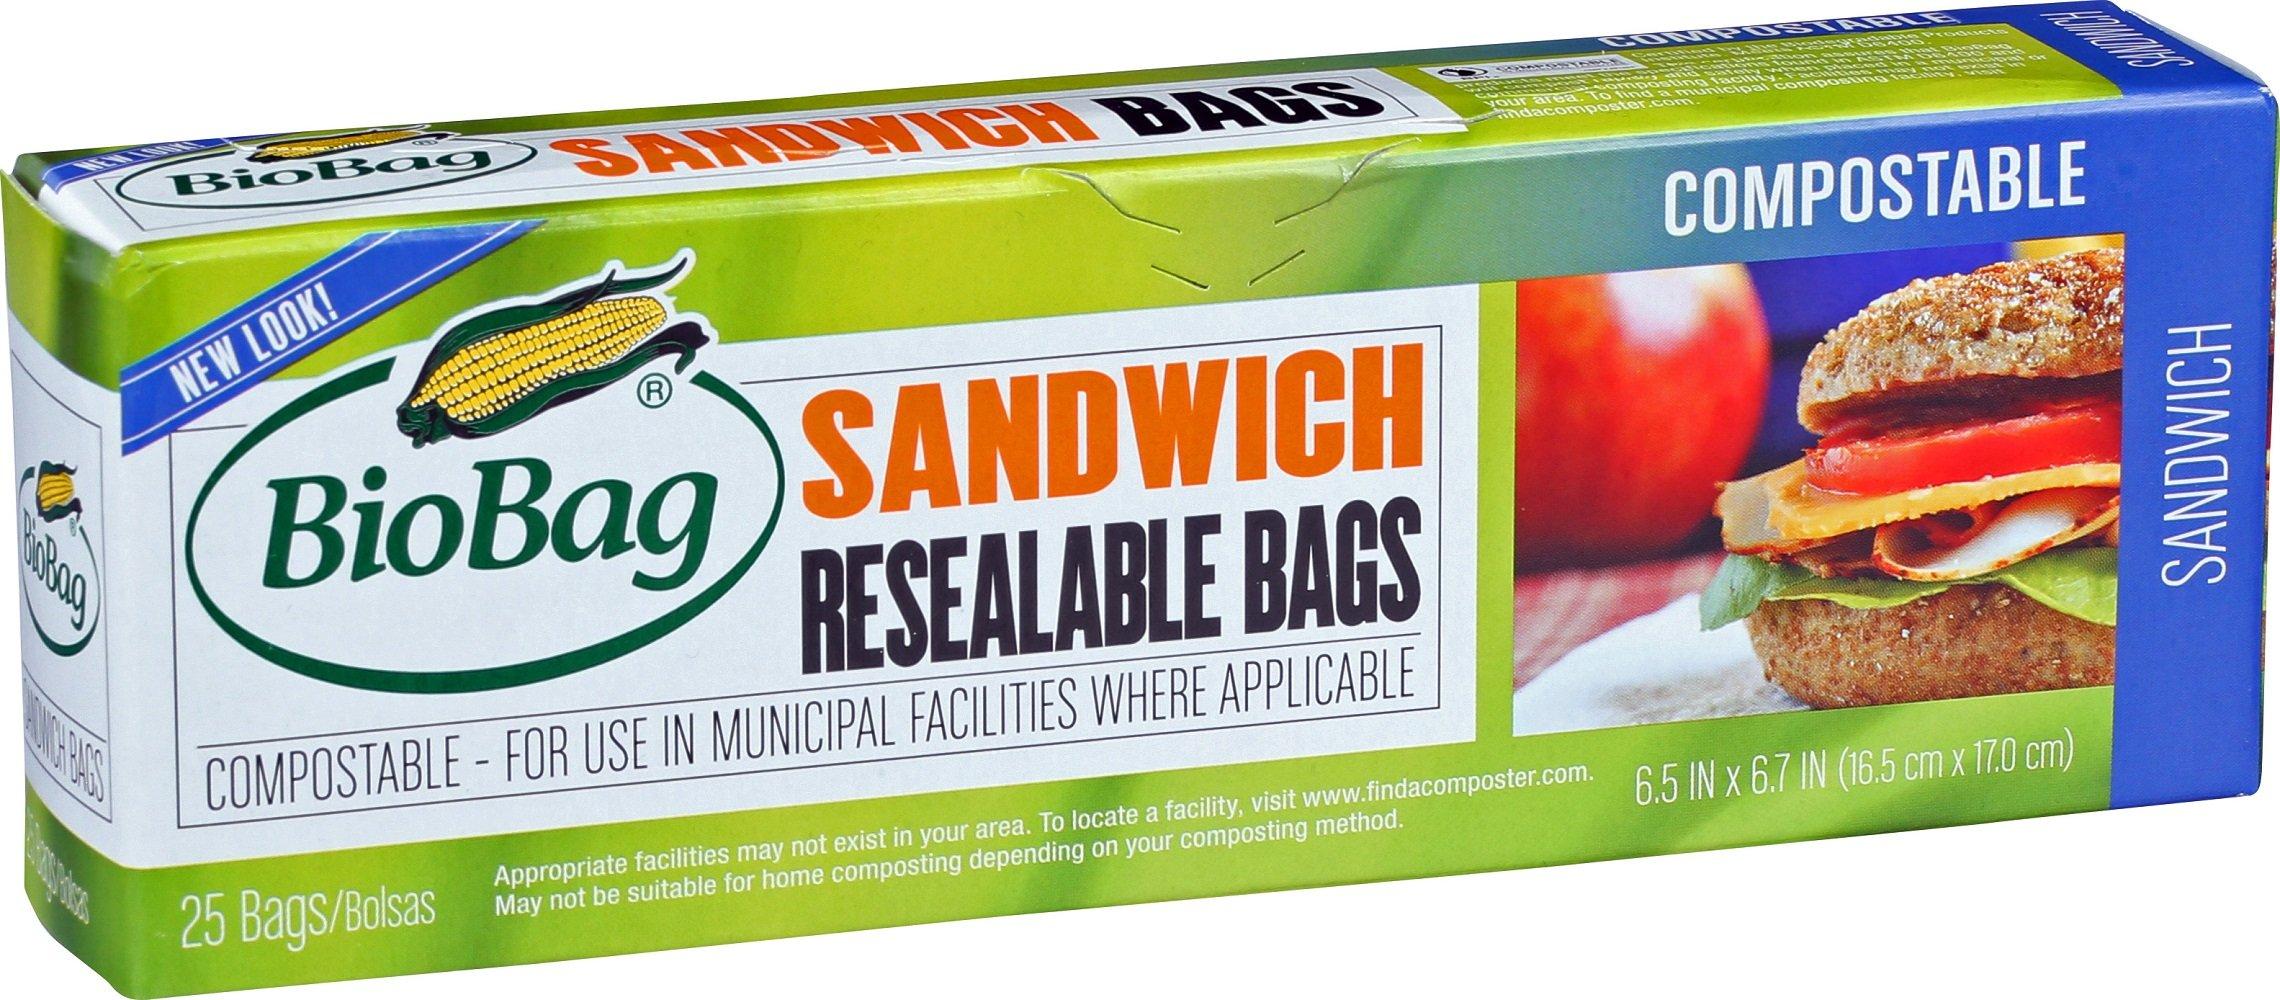 BioBag Resealable Compostable Food Storage Bags